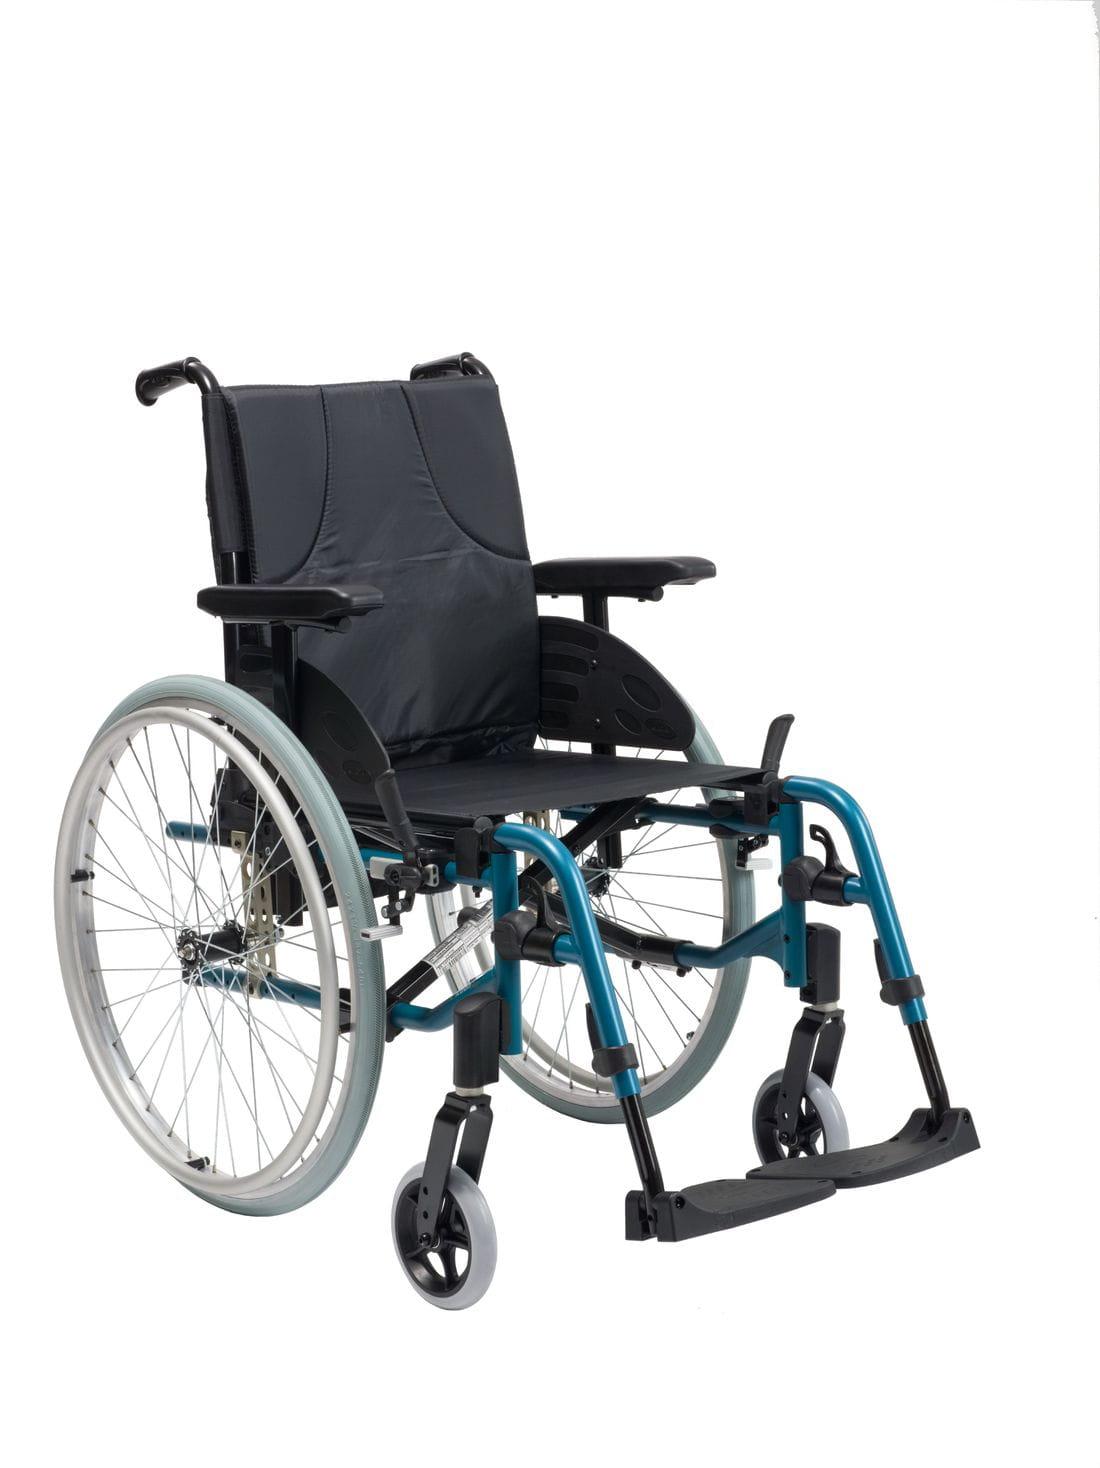 Sillas de ruedas manuales A3NG